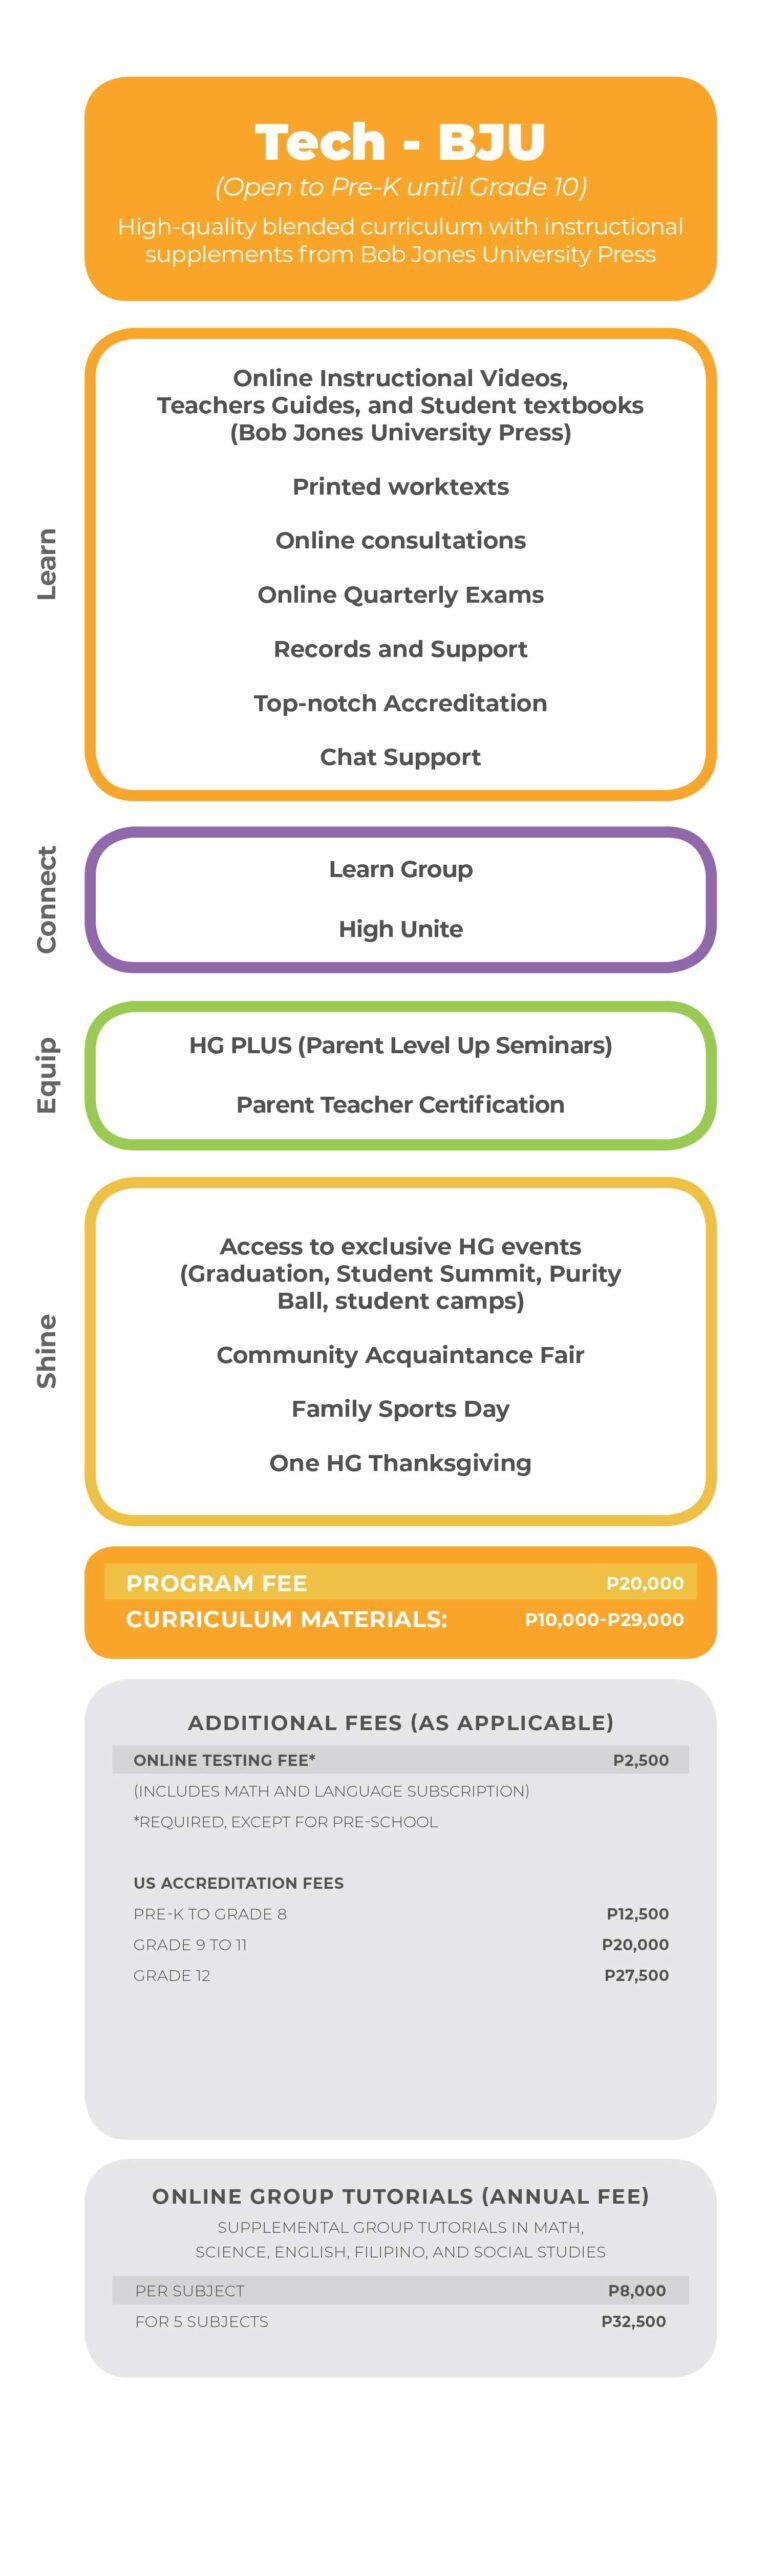 HGPH-BJU-08192020-w-pricing